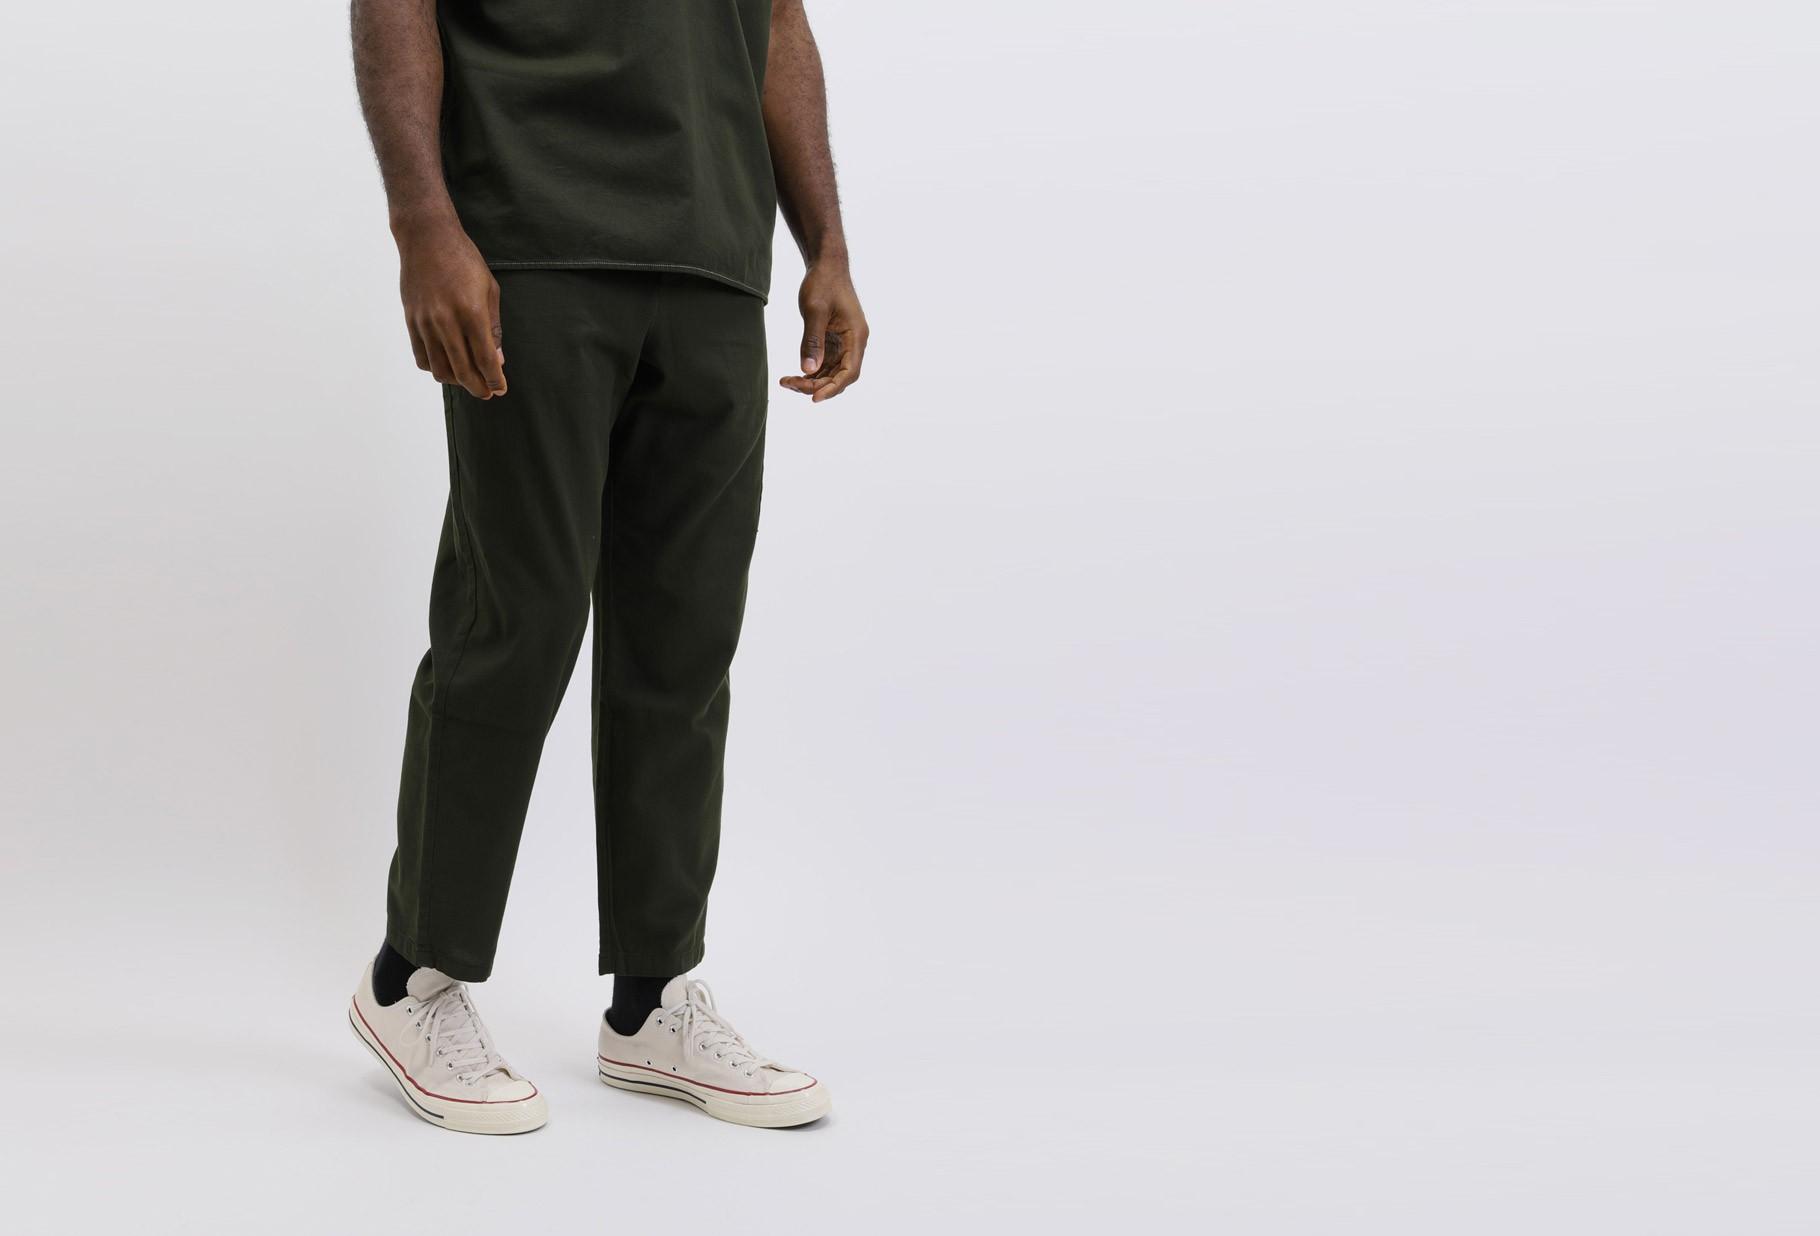 OLIVER SPENCER / Judo pant cotton Forest green